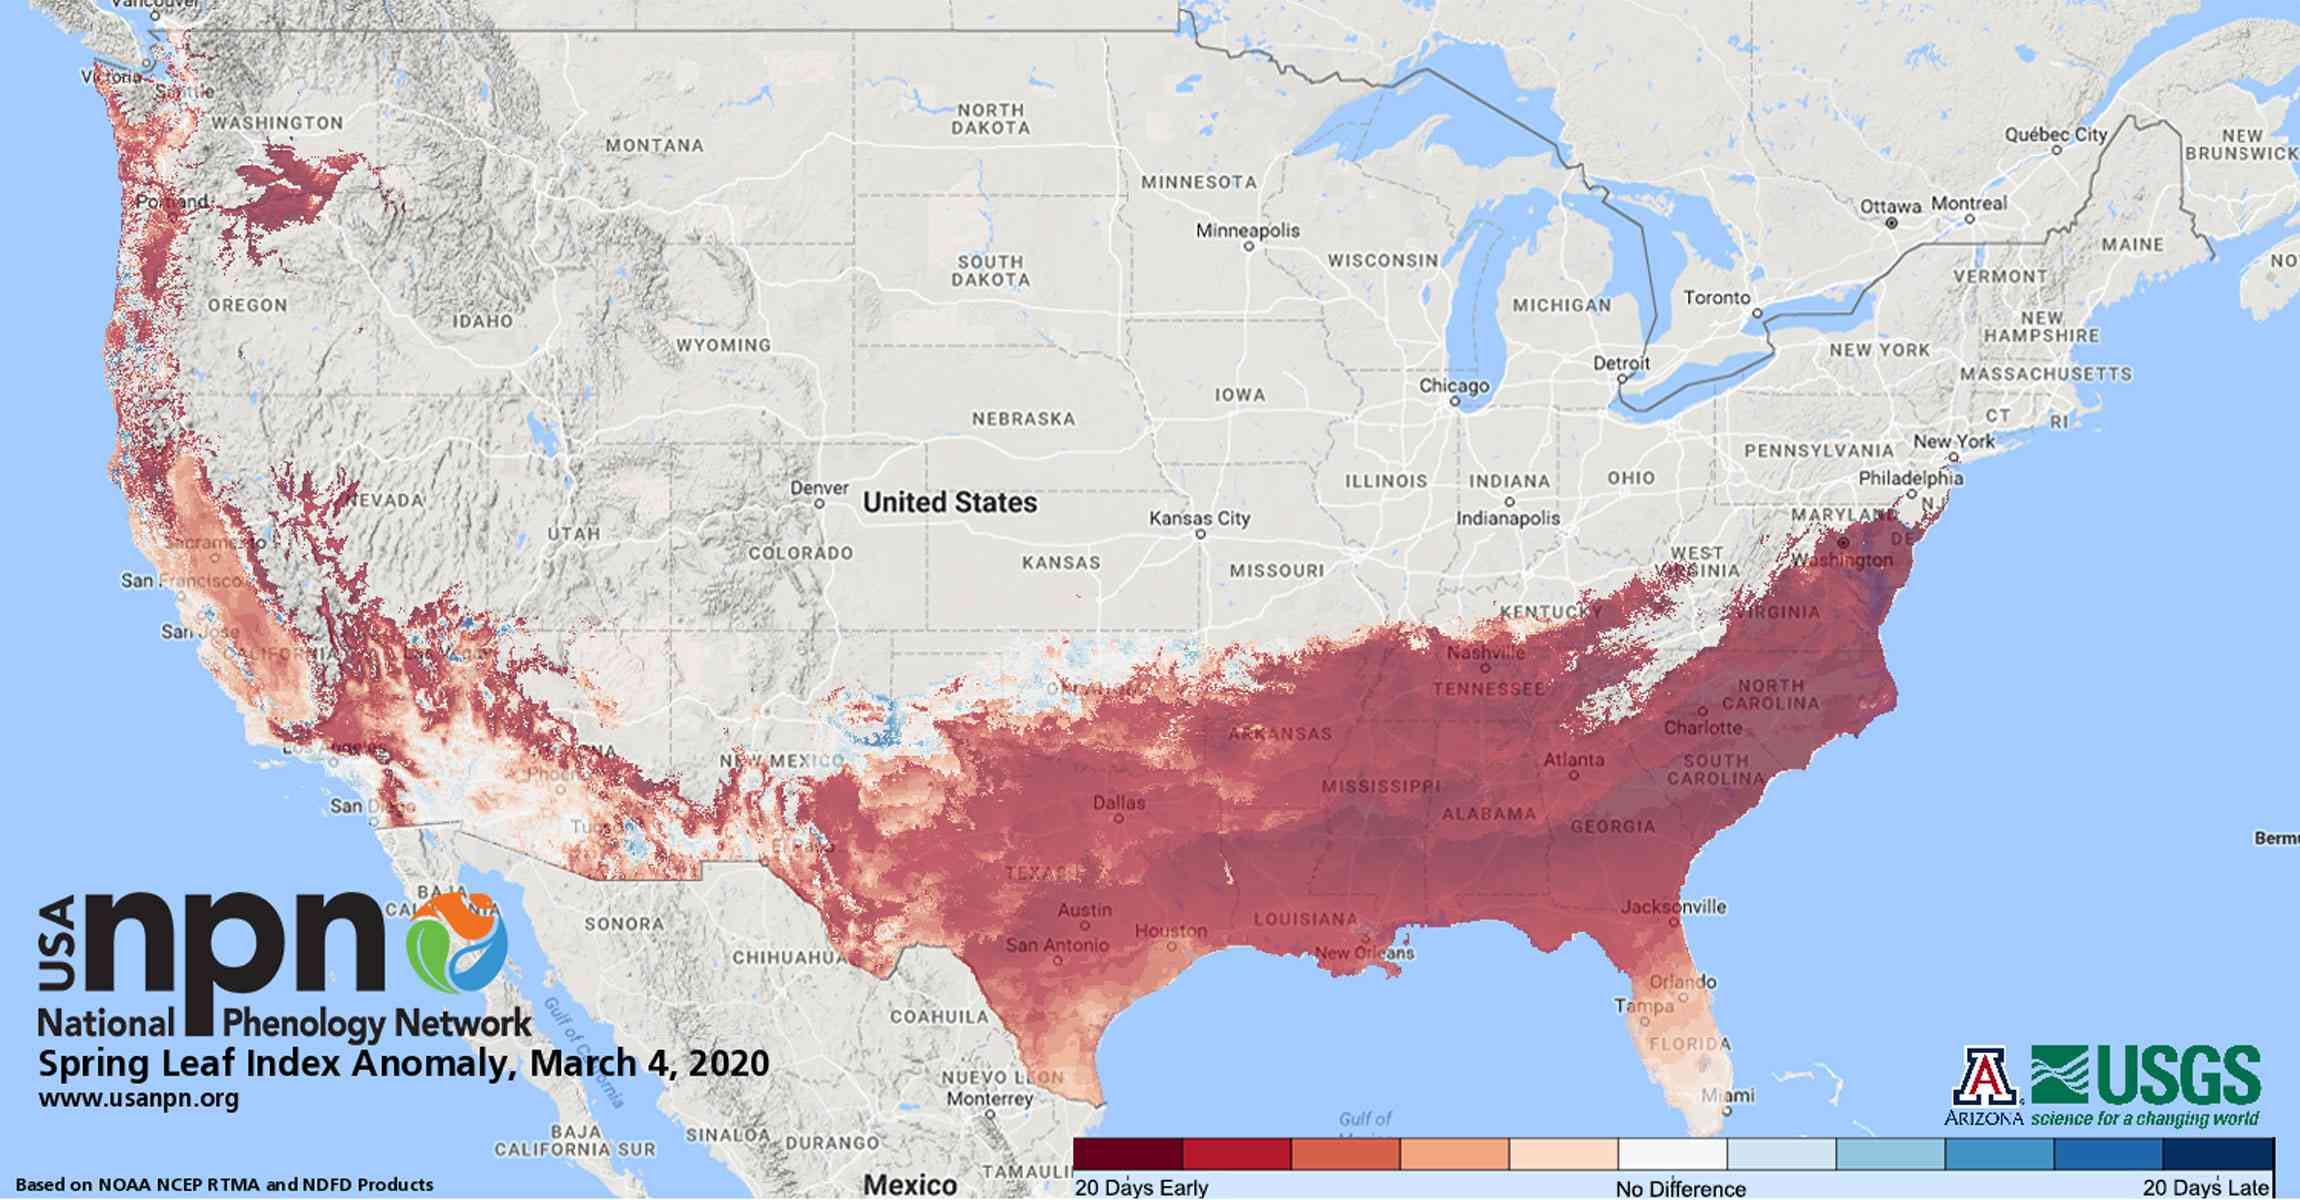 spring leaf index anomaly